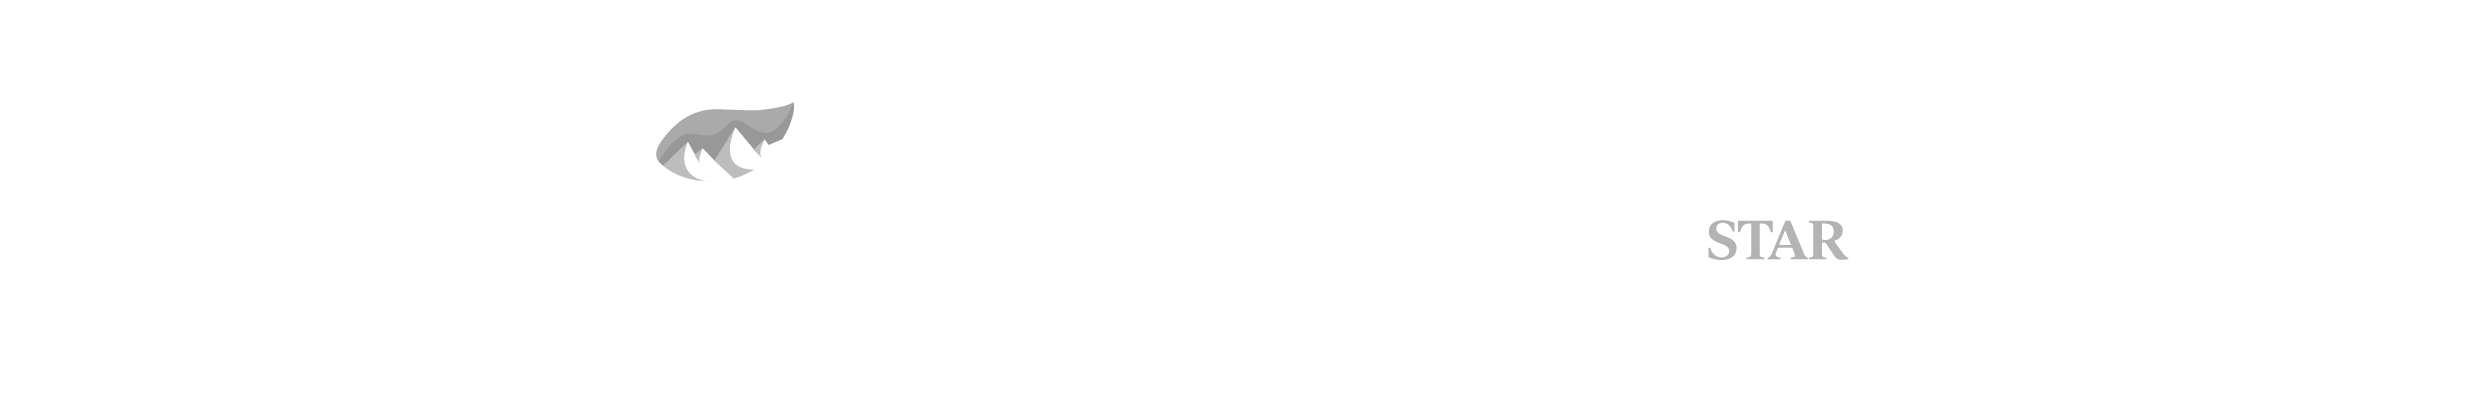 Client Logo Slider - 3